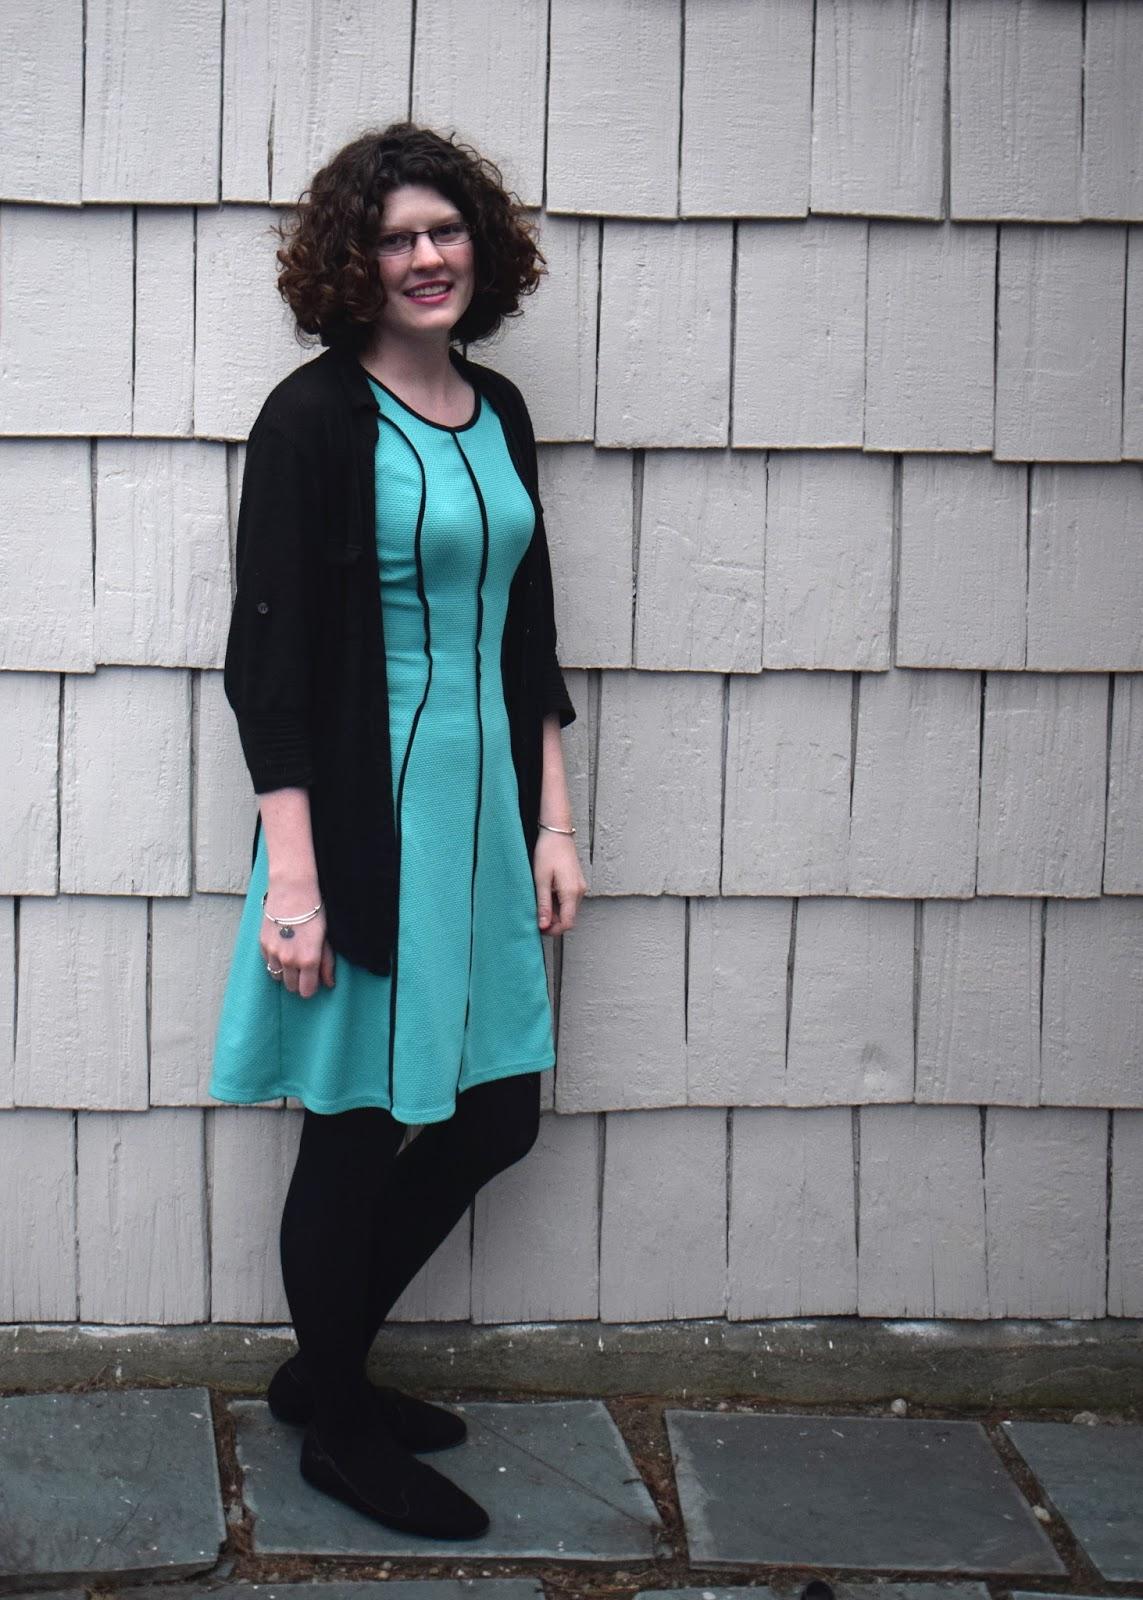 Easter Cyan (+ Bridesmaid Dress First Look!) | Pennies & Paper Blog